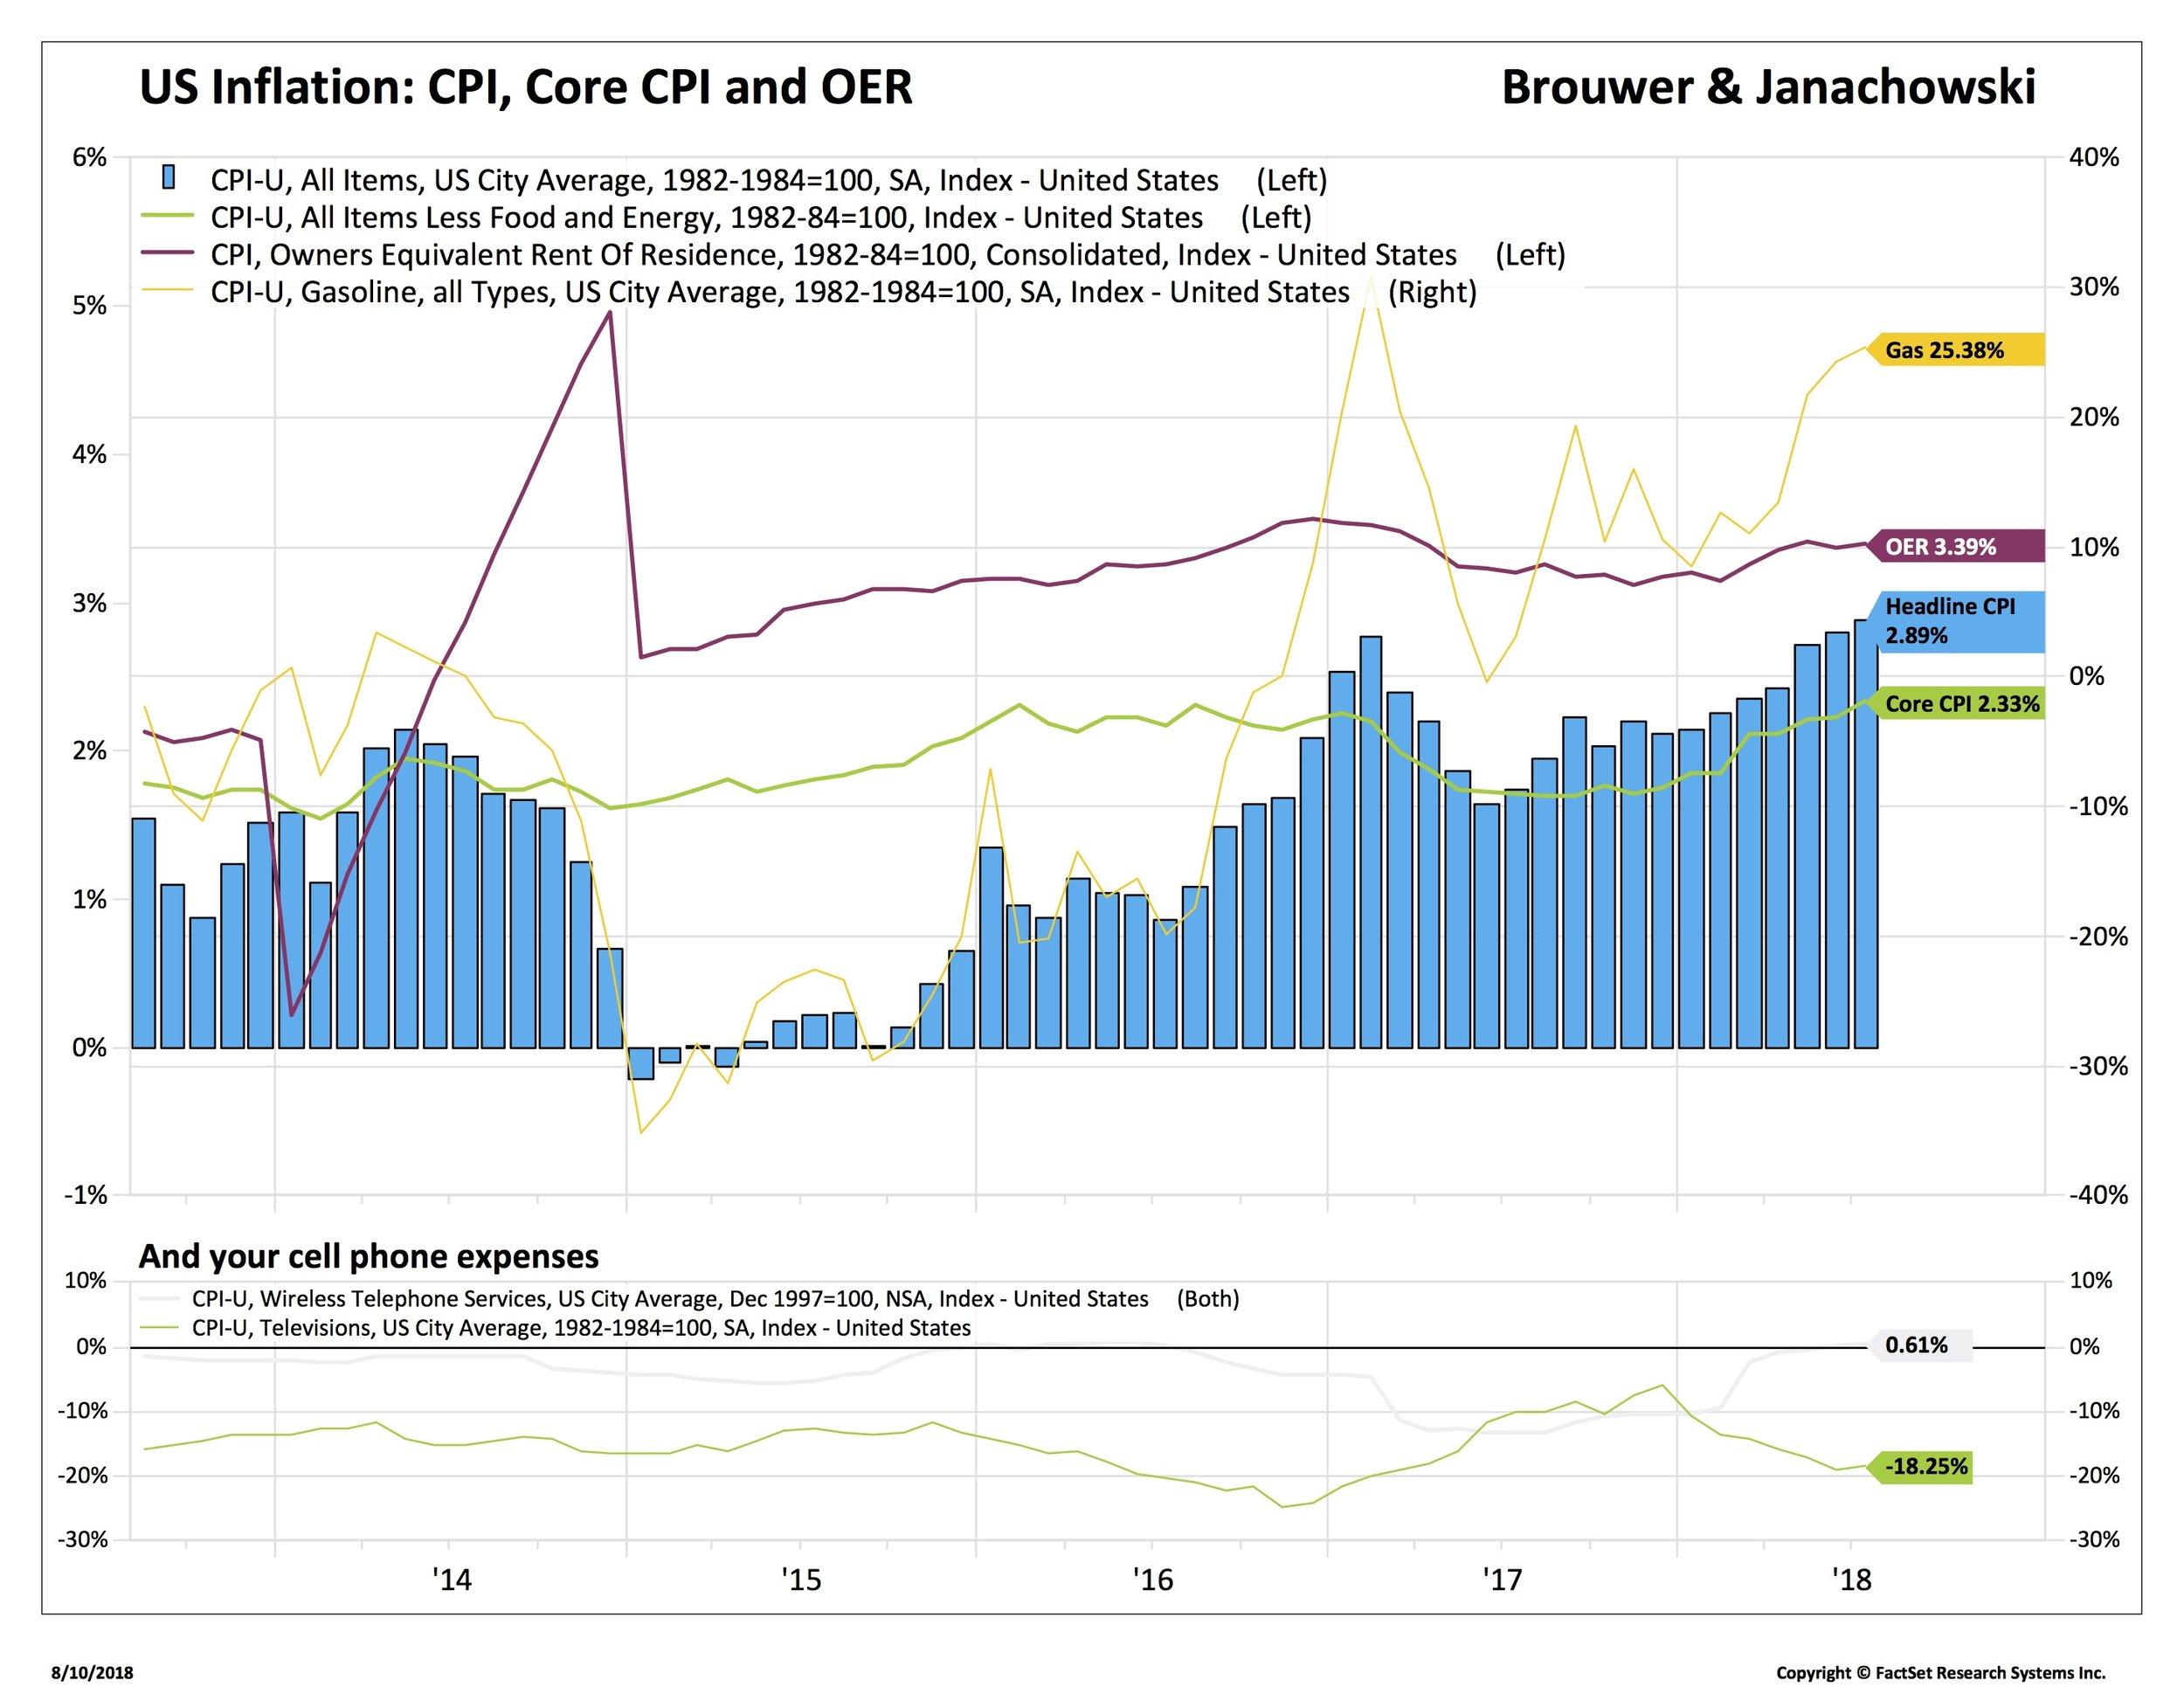 1 CPI, core OER 2_BDX-USA.jpg